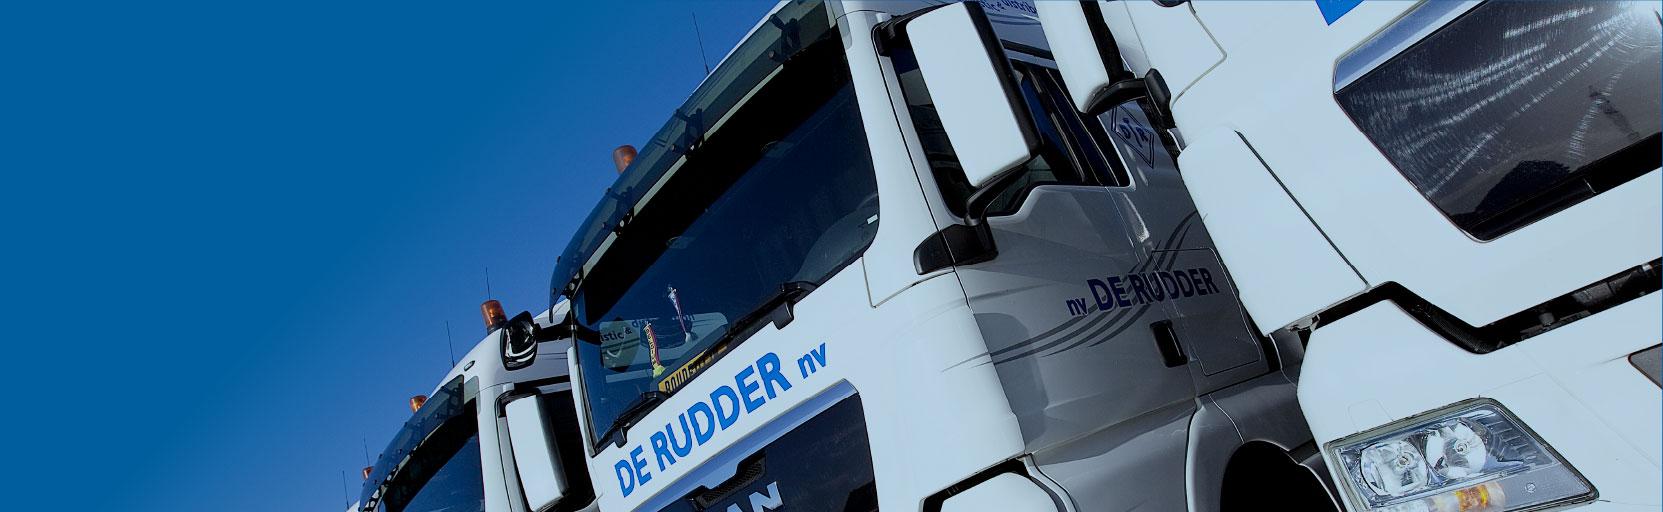 De Rudder Transport: investir dans l'avenir avec eTrans et eMobile